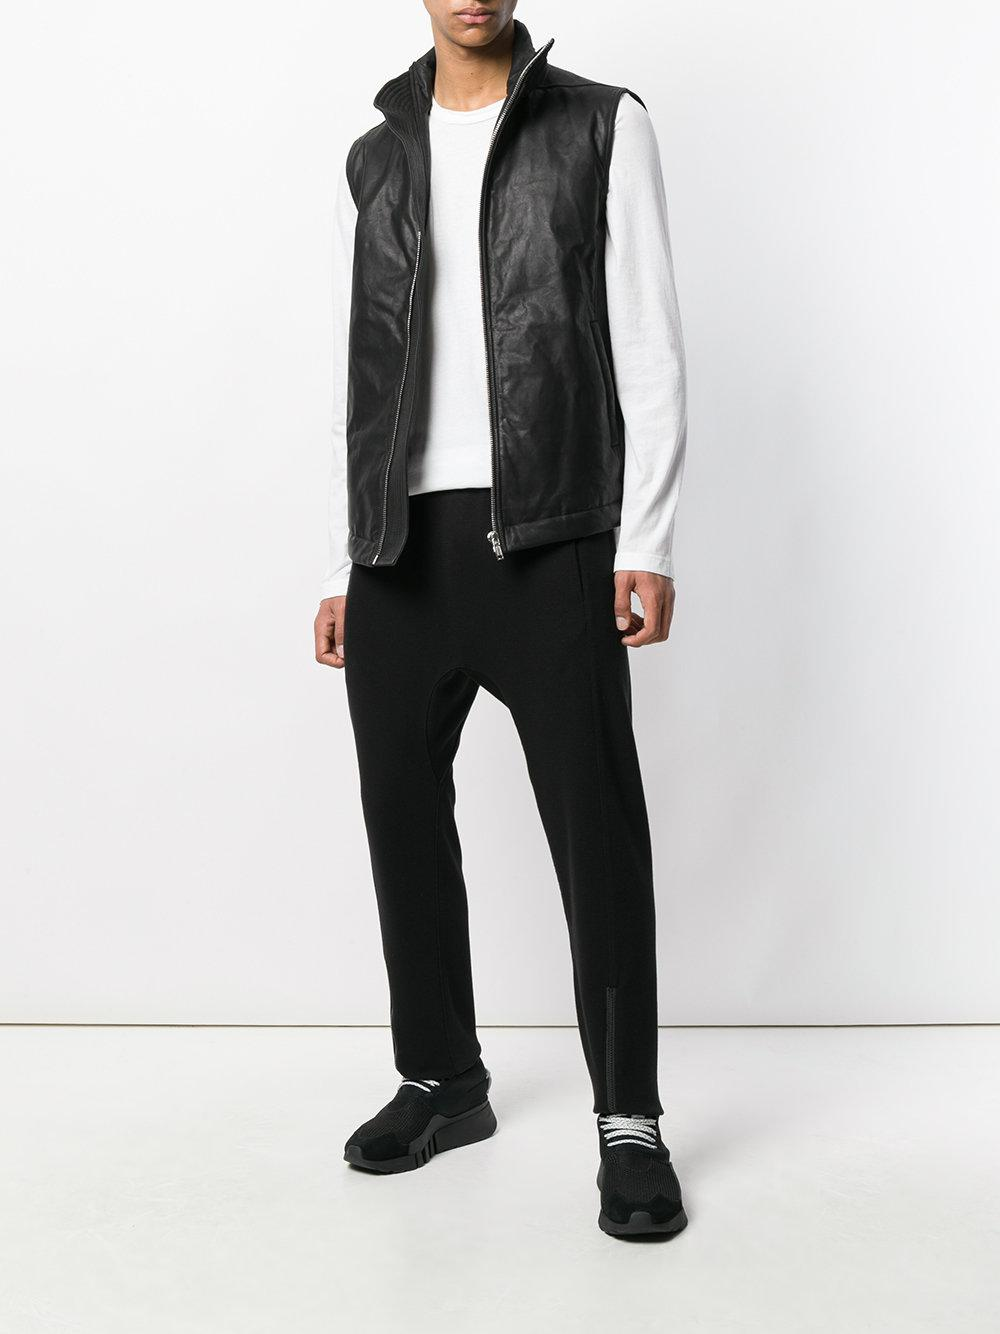 4c4ec622b7cfc Lyst - Rick Owens Asymmetric Sleeveless Leather Jacket in Black for Men